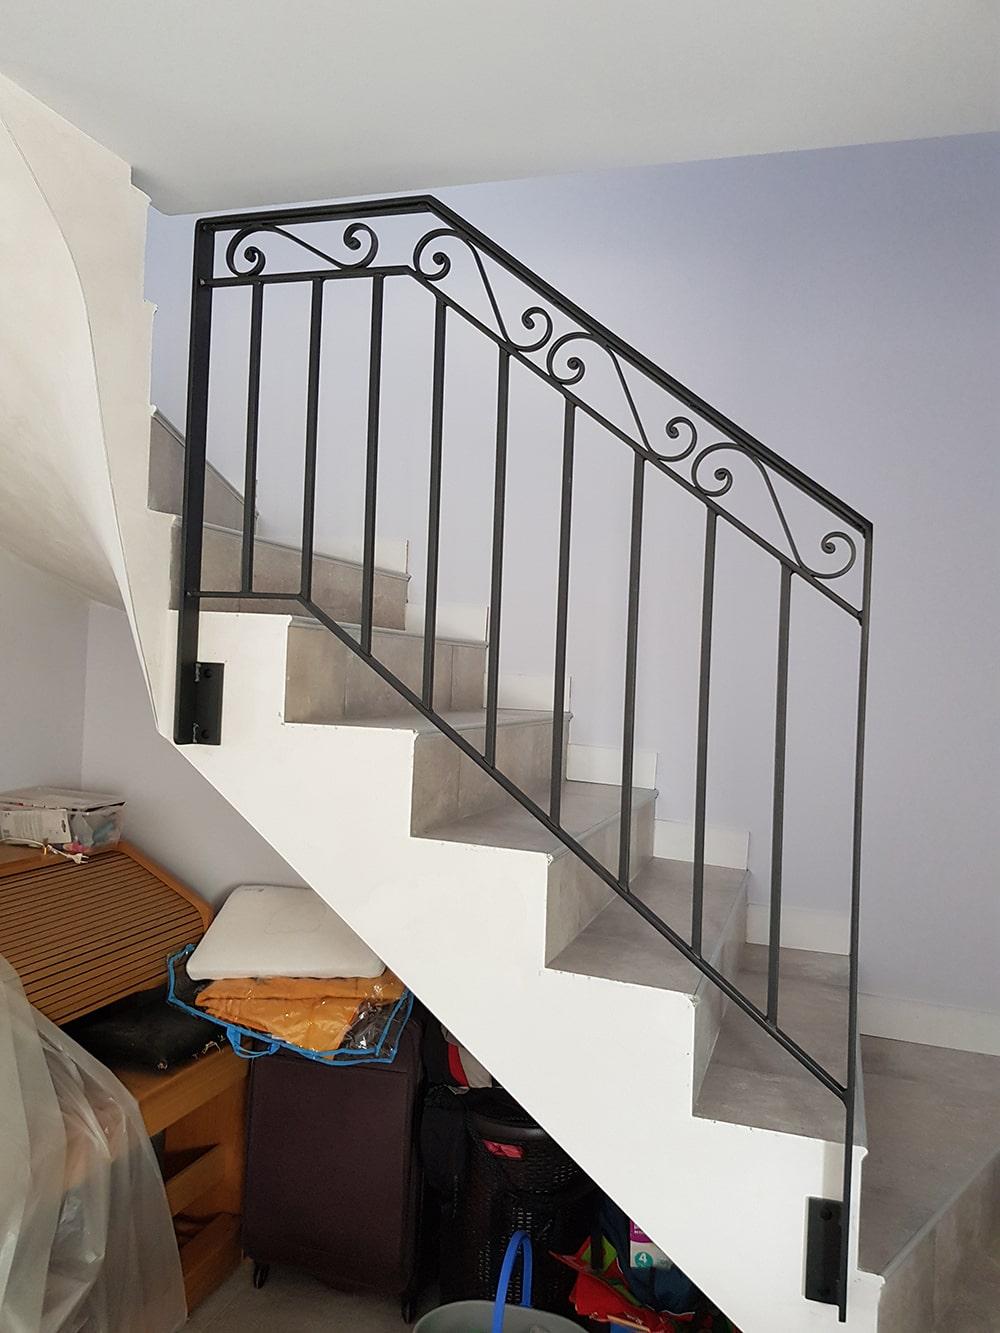 Garde-corps sur escalier rampant